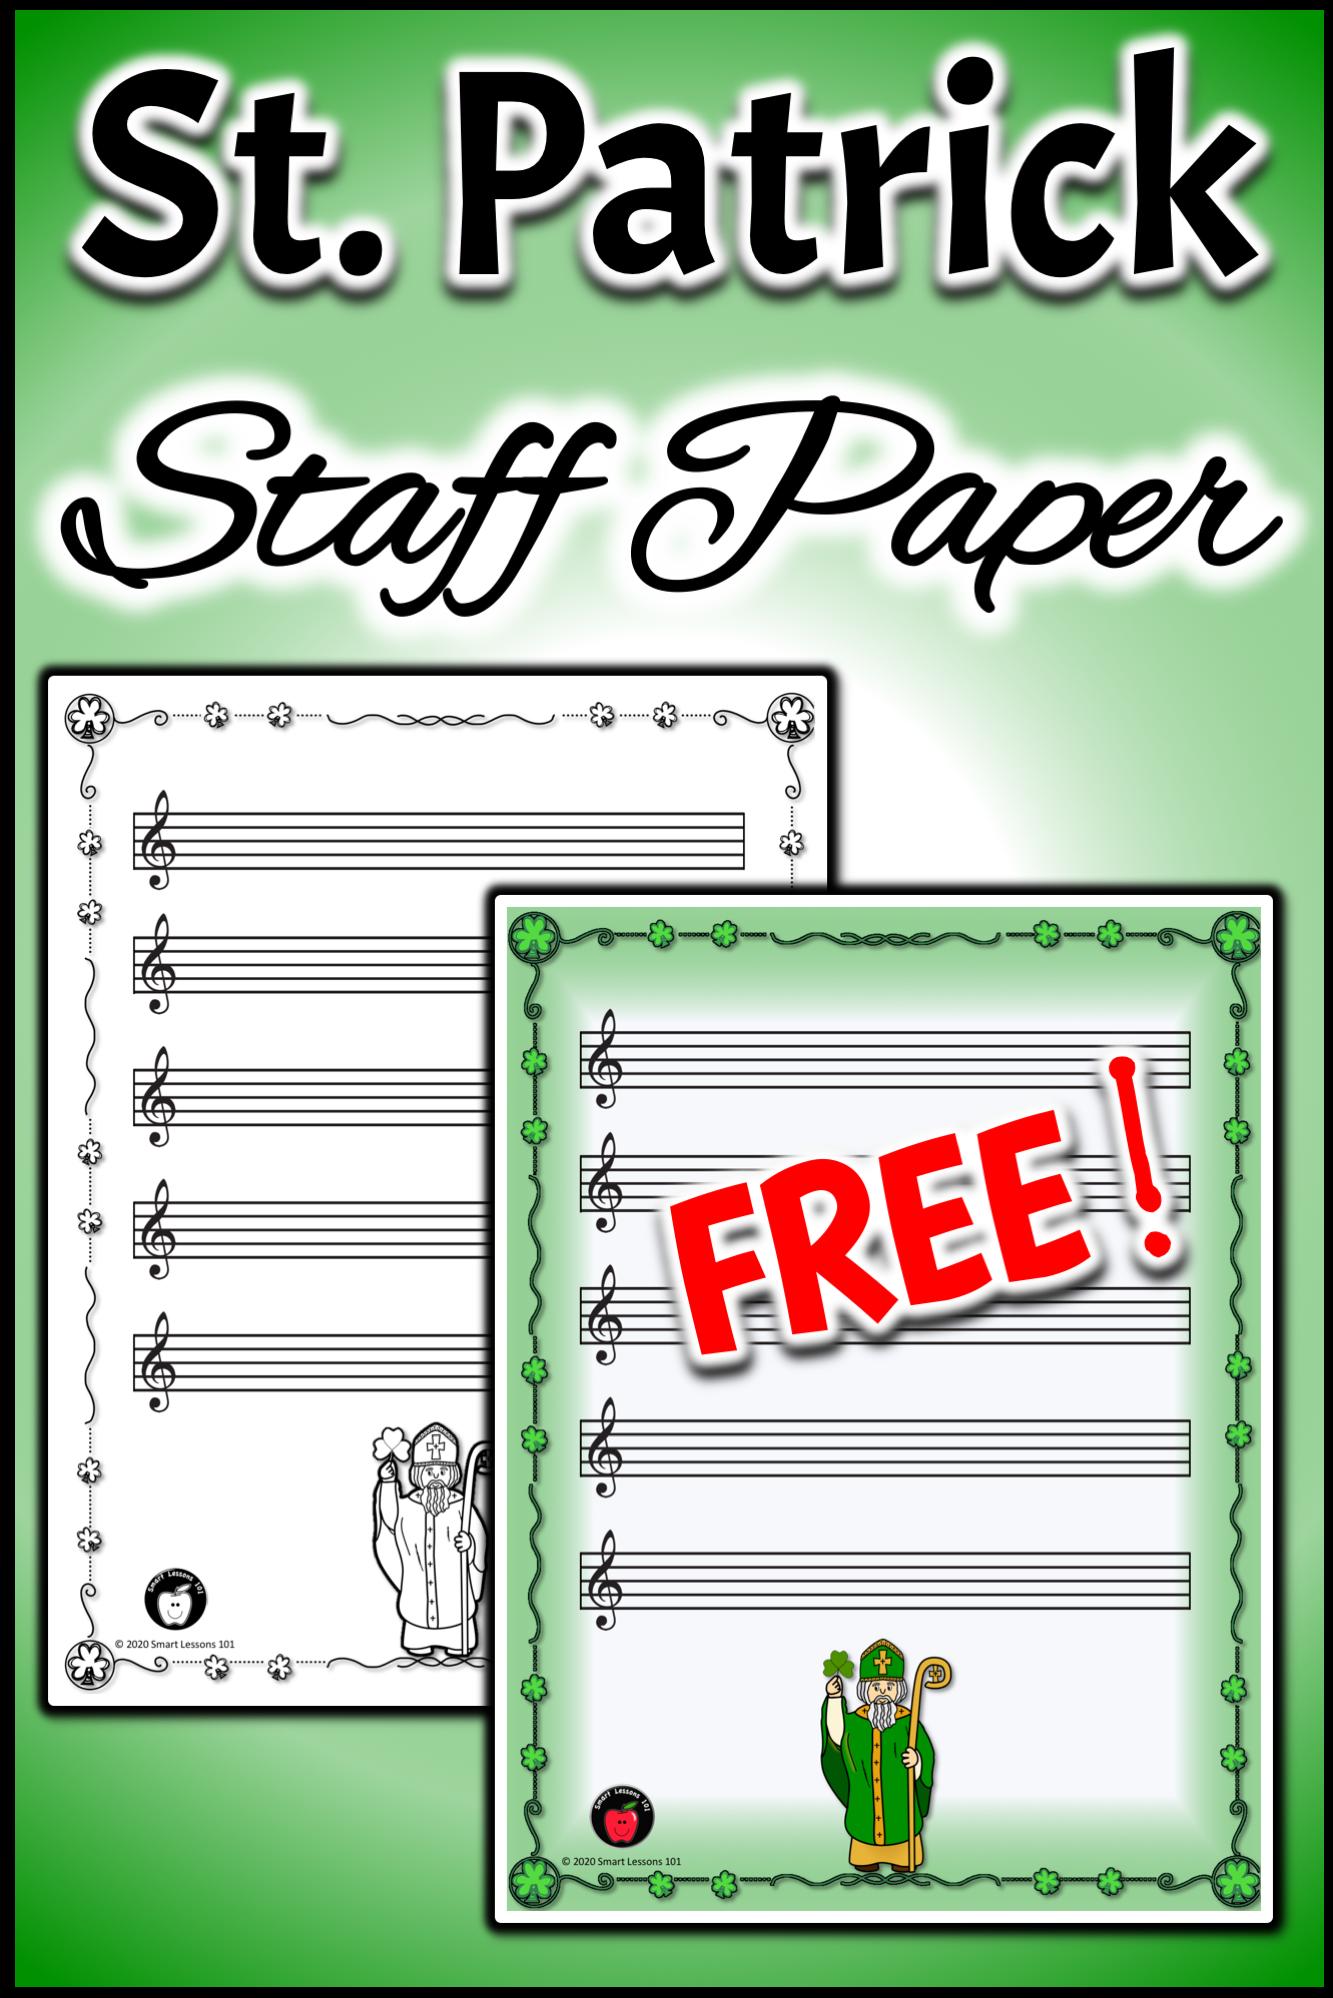 Free St Patrick Staff Paper Music Worksheets Free